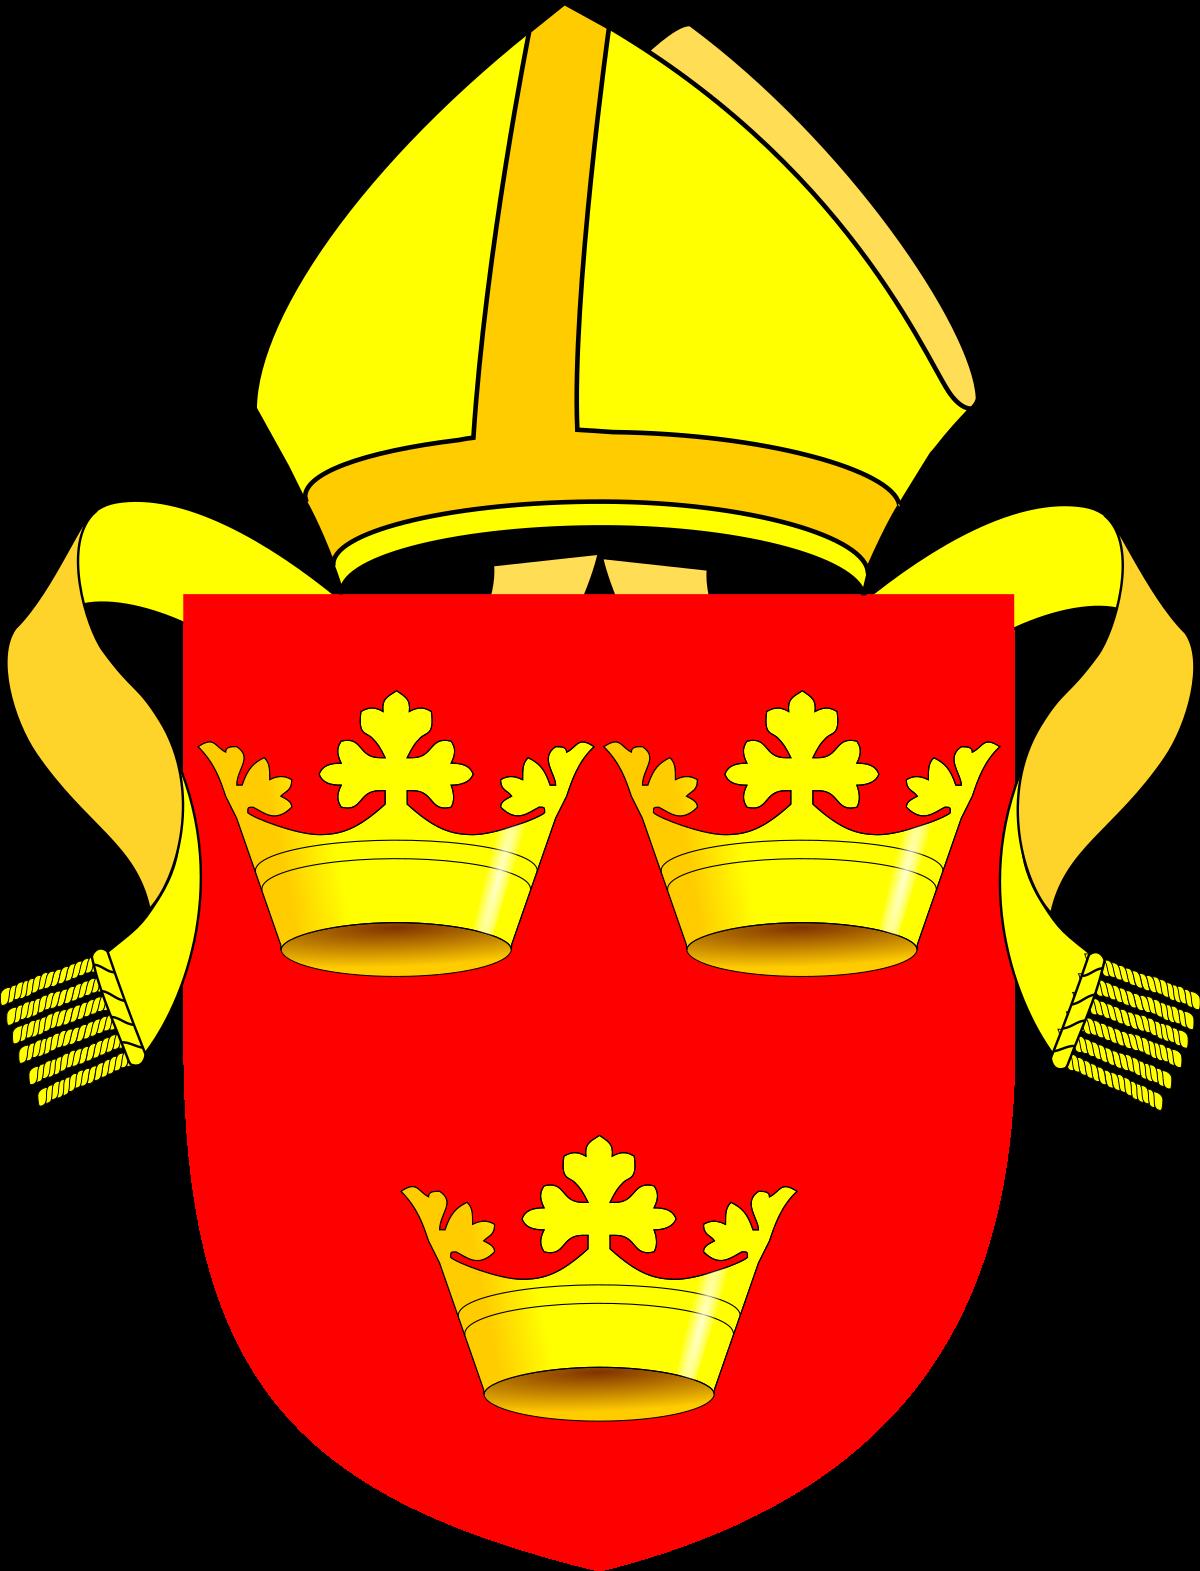 Pastor clipart vicar. Bishop of ely wikipedia